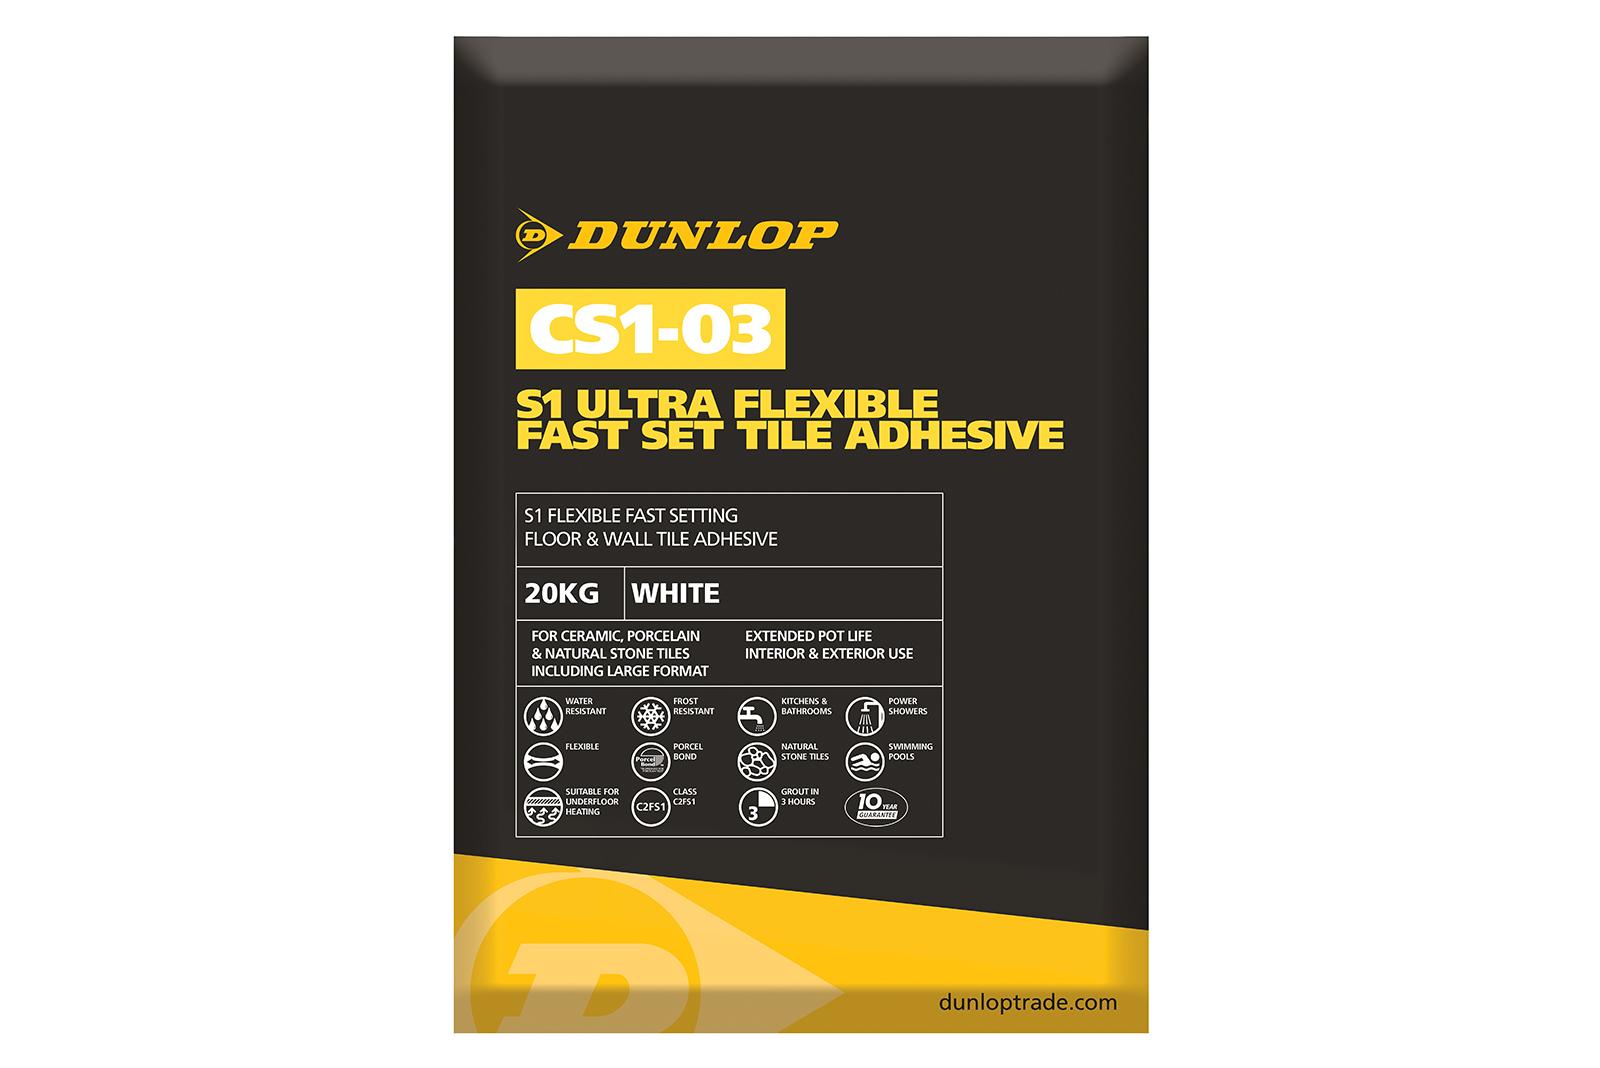 Dunlop 4.41.47 PM